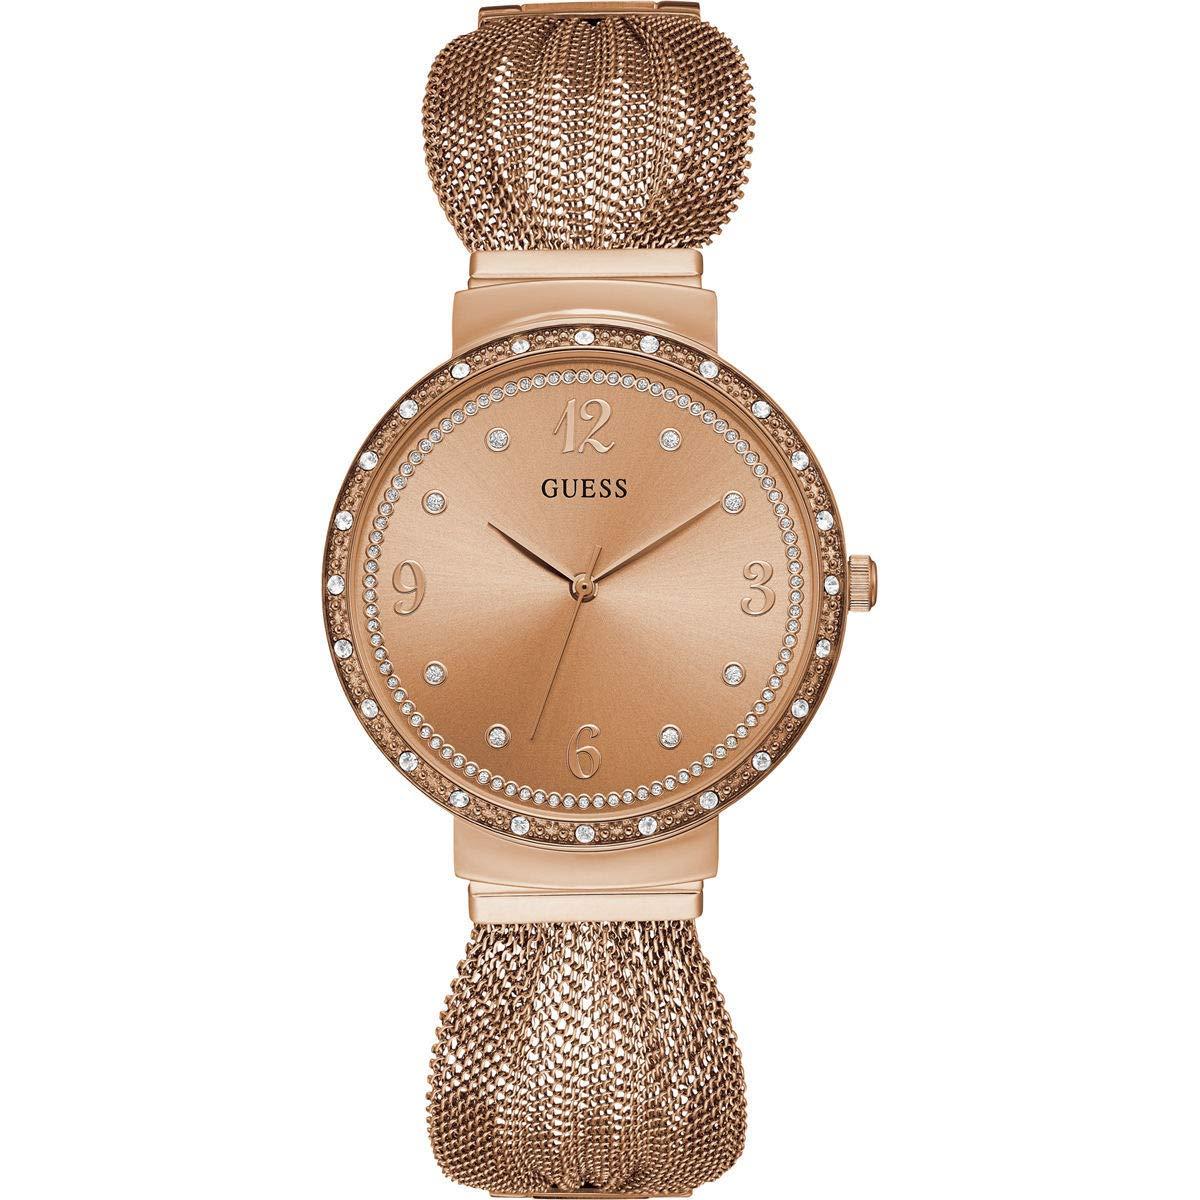 online retailer 420e7 775be Guess Damen Analog Quarz Uhr mit Edelstahl Armband W1083L3 - Radau Pigiau